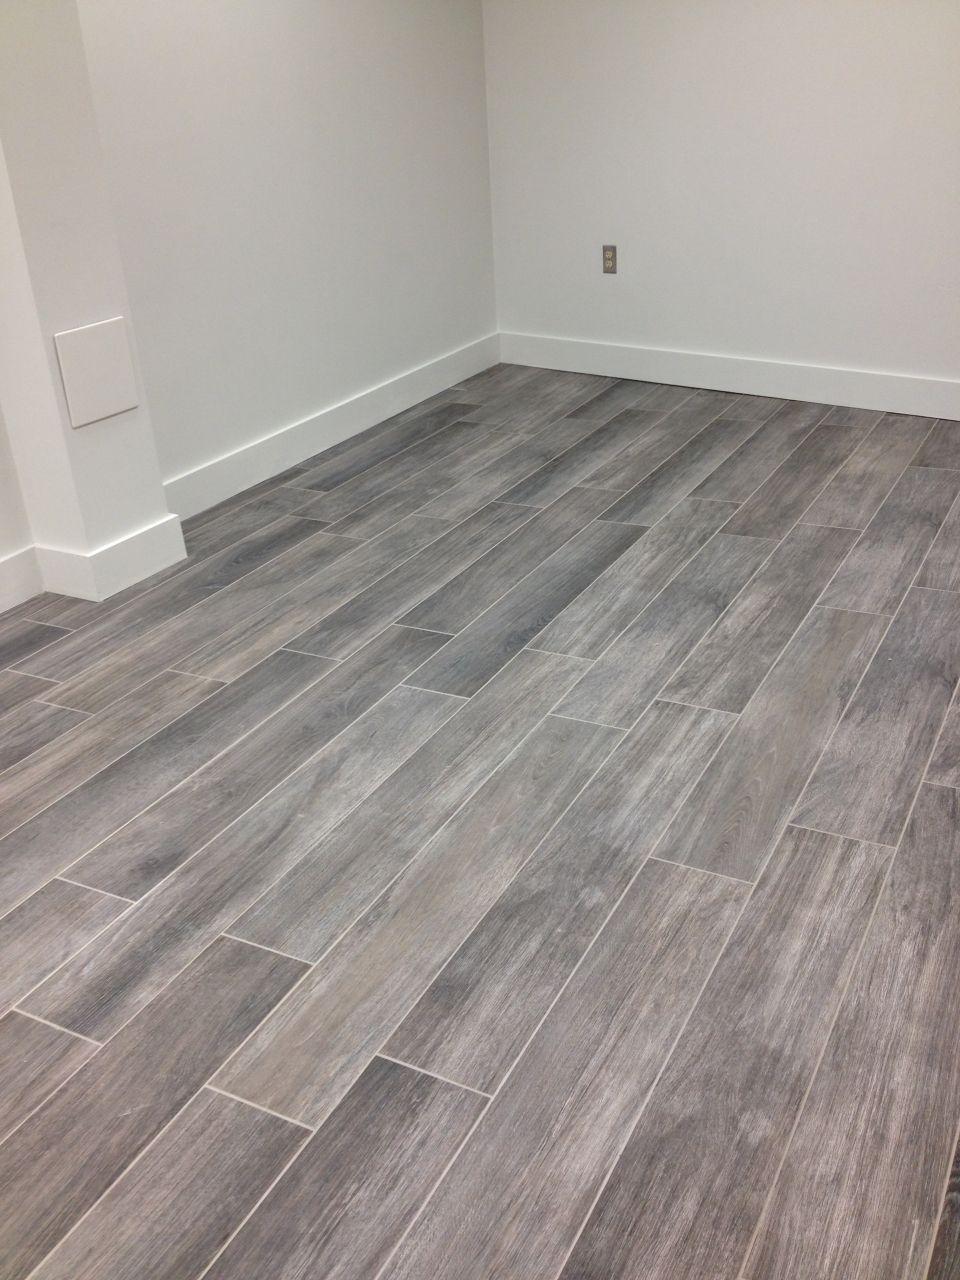 hardwood floor tiles gray wood tile floor no3lcd6n8 YCVKZOM